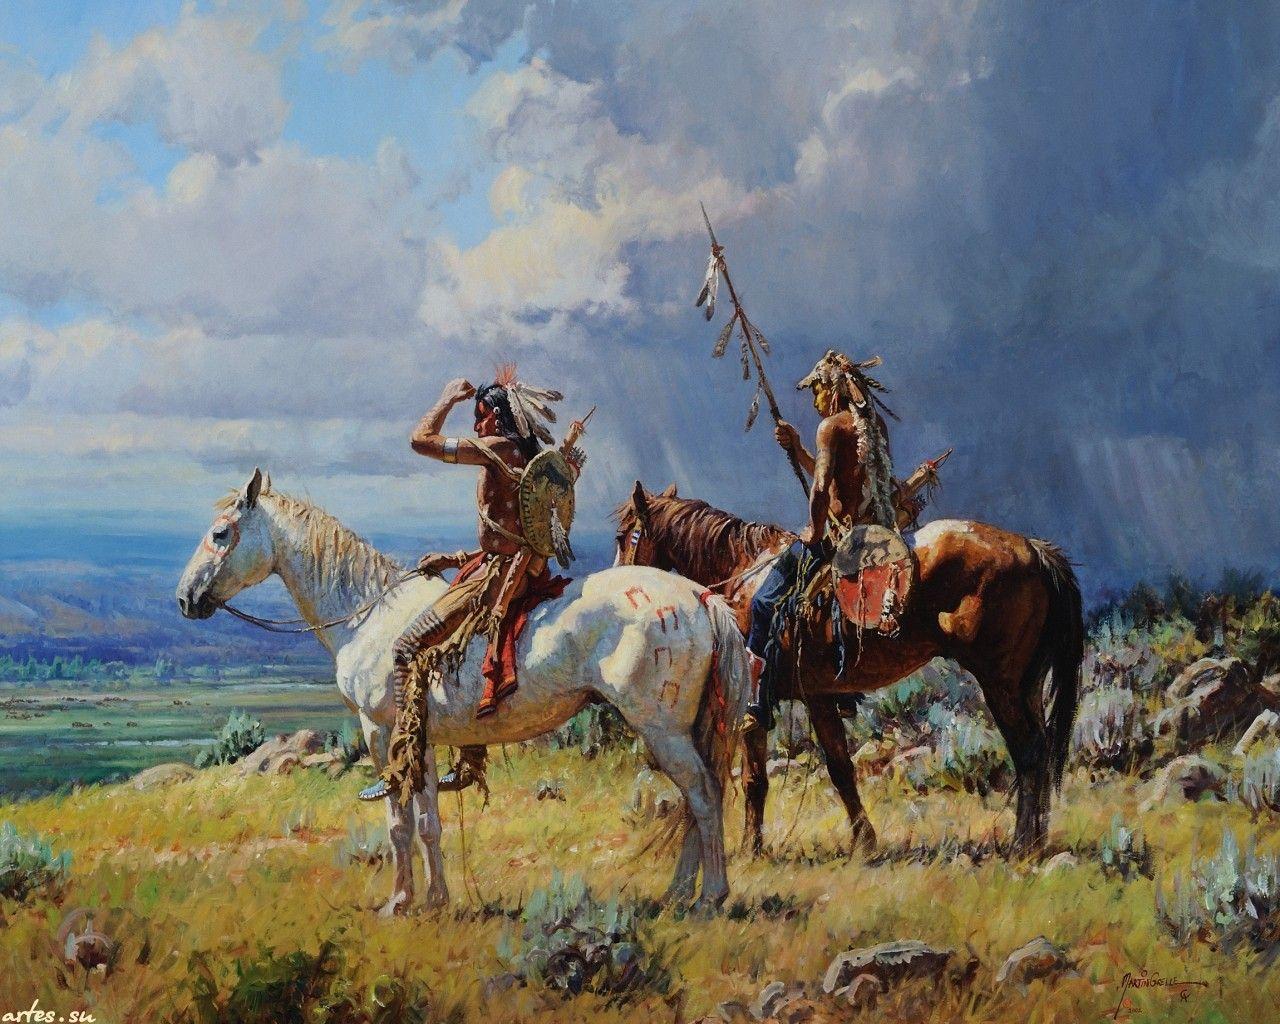 native paintings artwork Native American Art by Martin